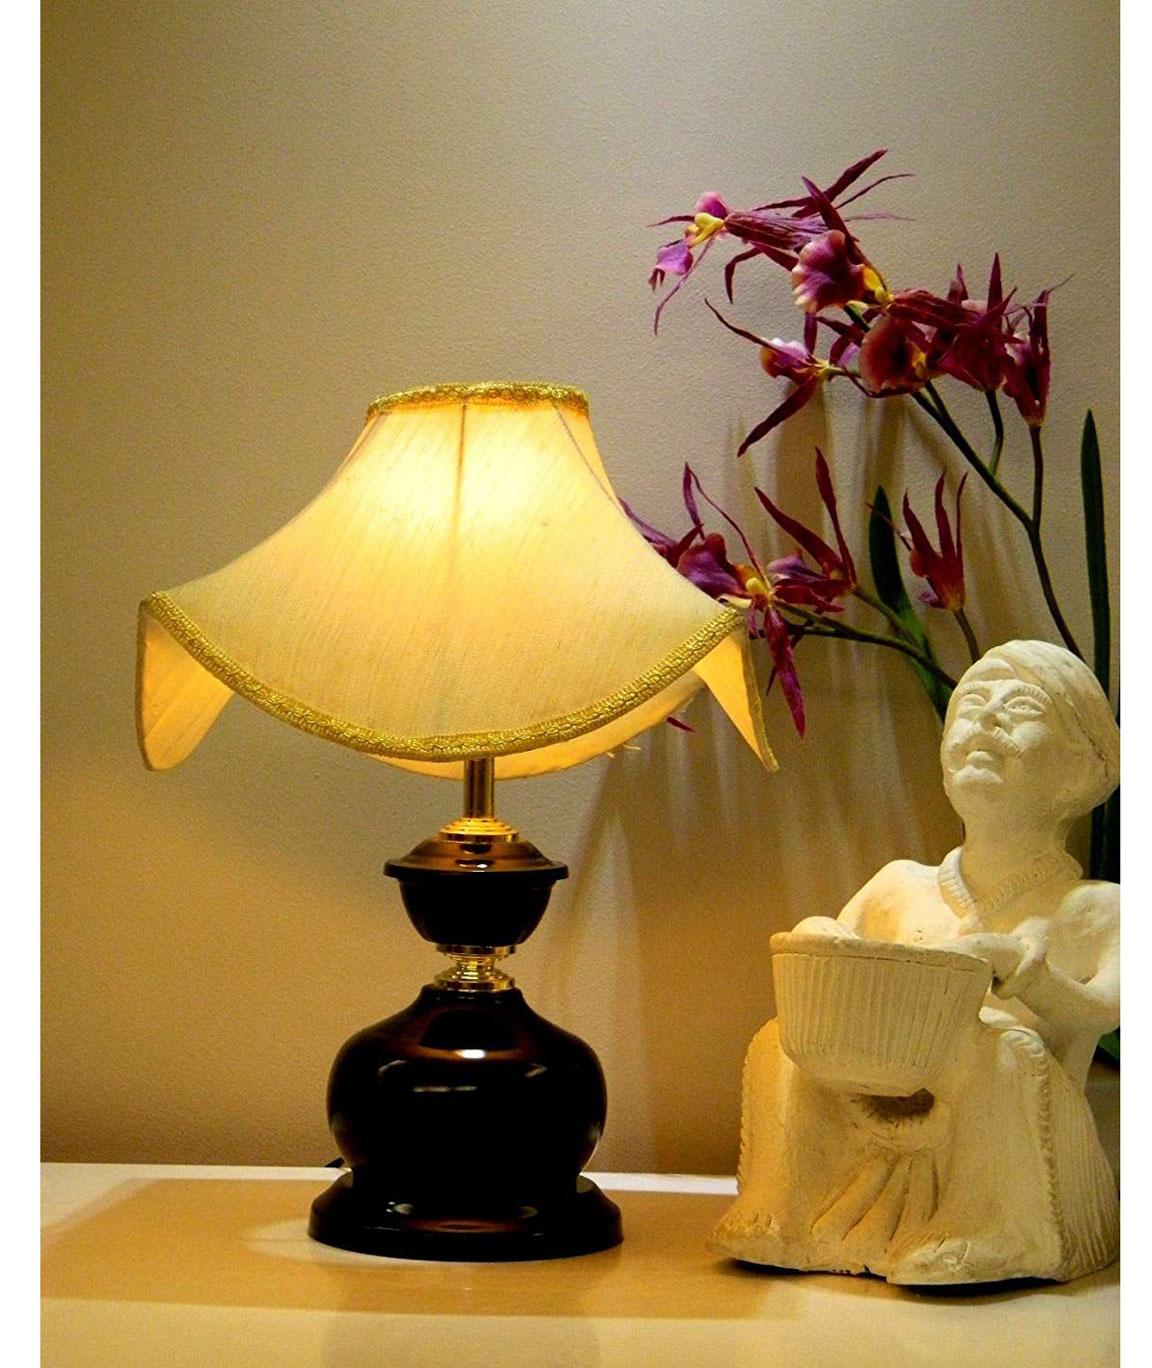 RDC Black Designer Table Lamp with 10 Inches Pagoda Cream-khadi with Lace Border Lamp Shade